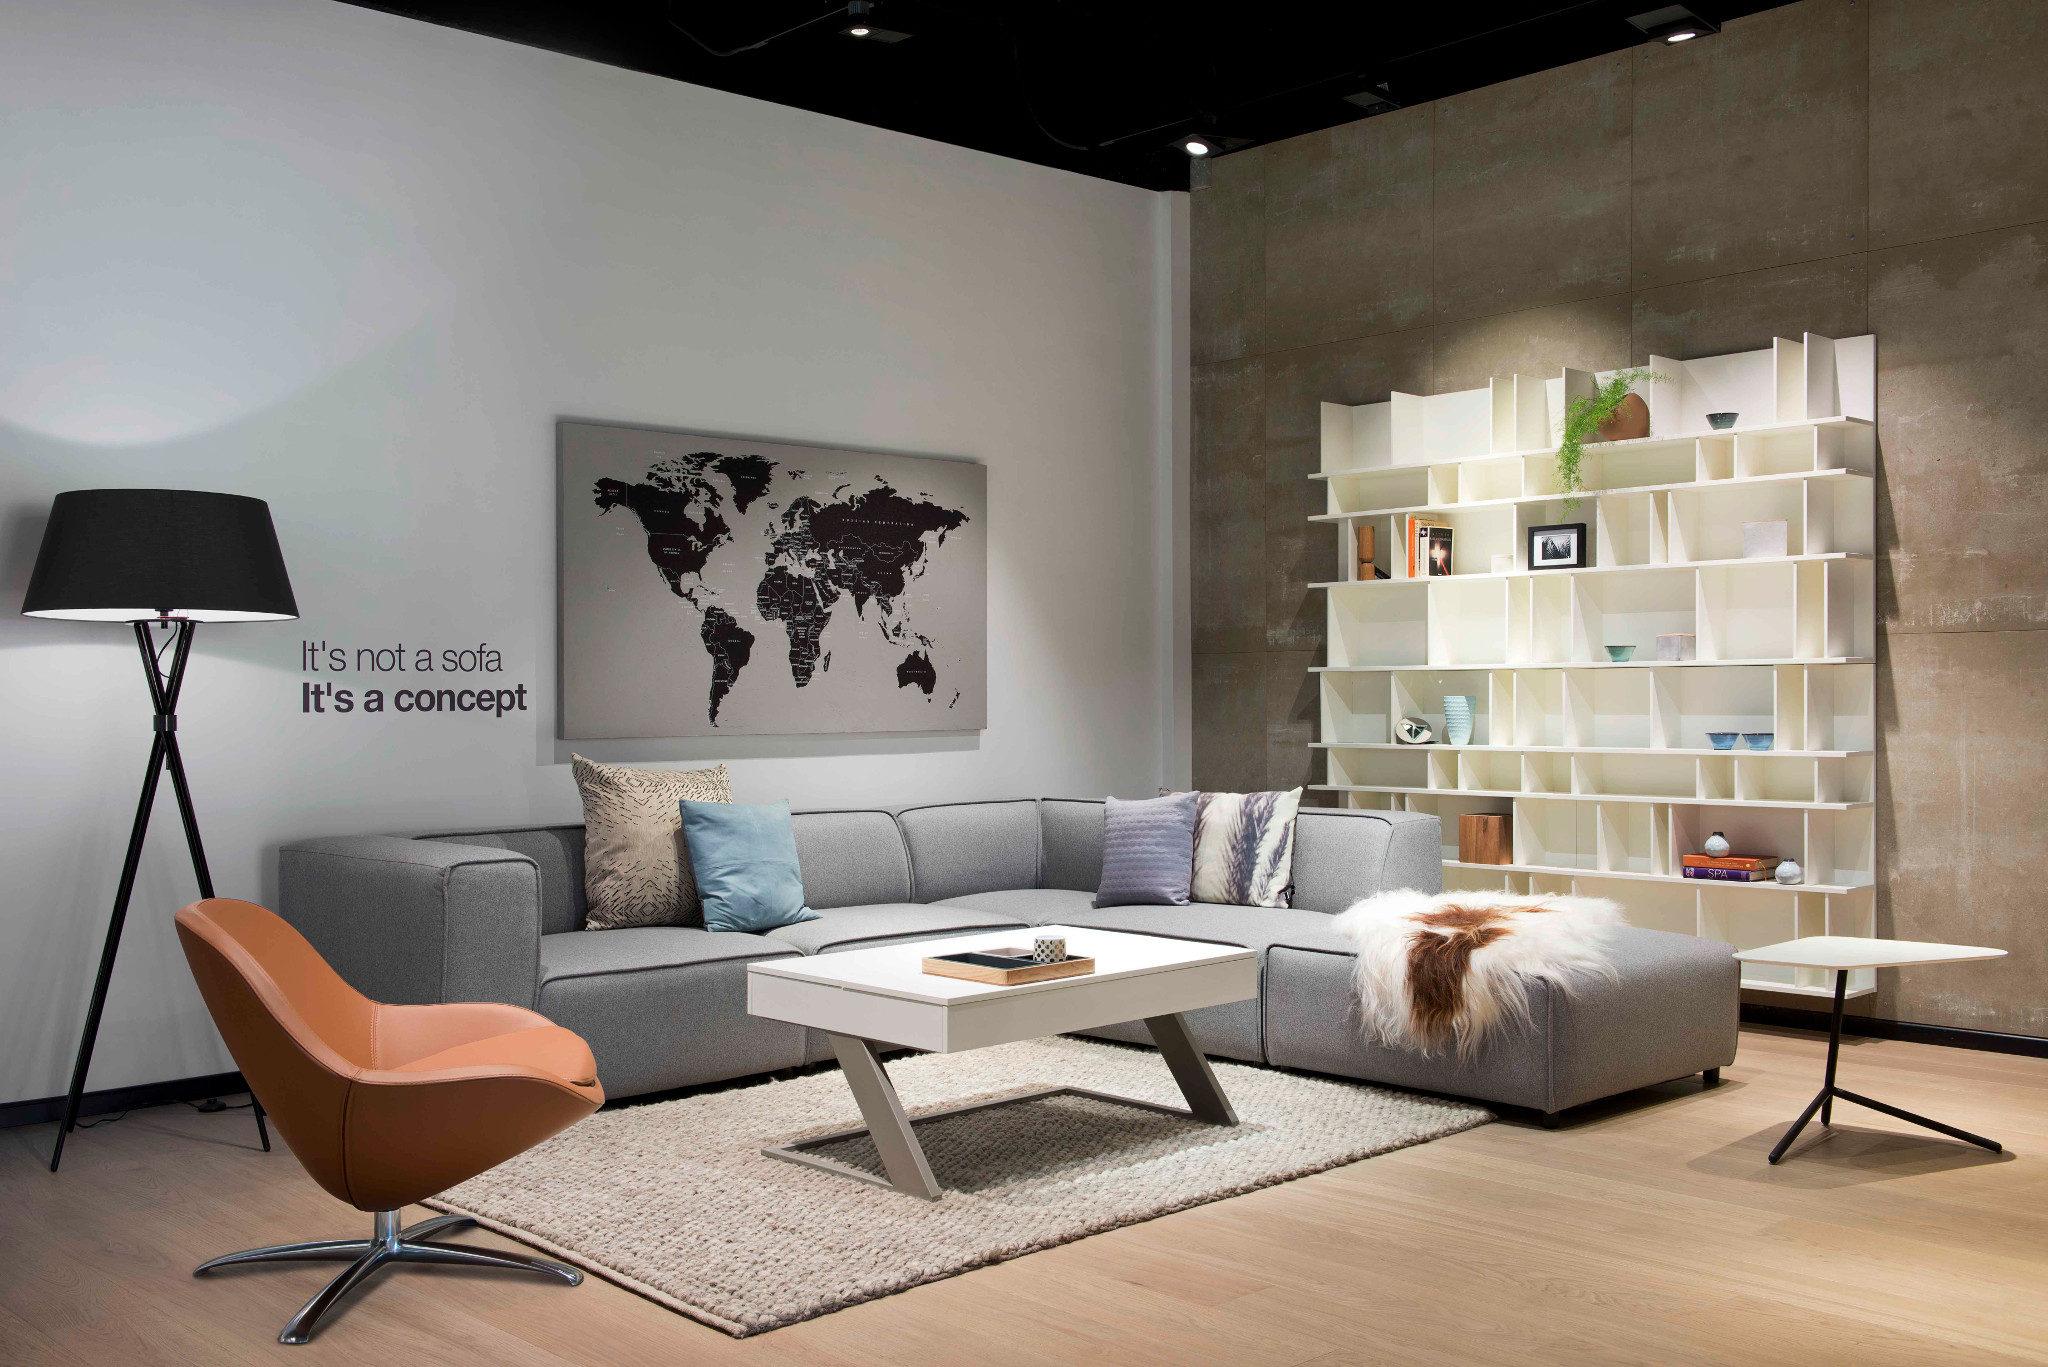 boconcept a praiseworthy concept mon voyage. Black Bedroom Furniture Sets. Home Design Ideas